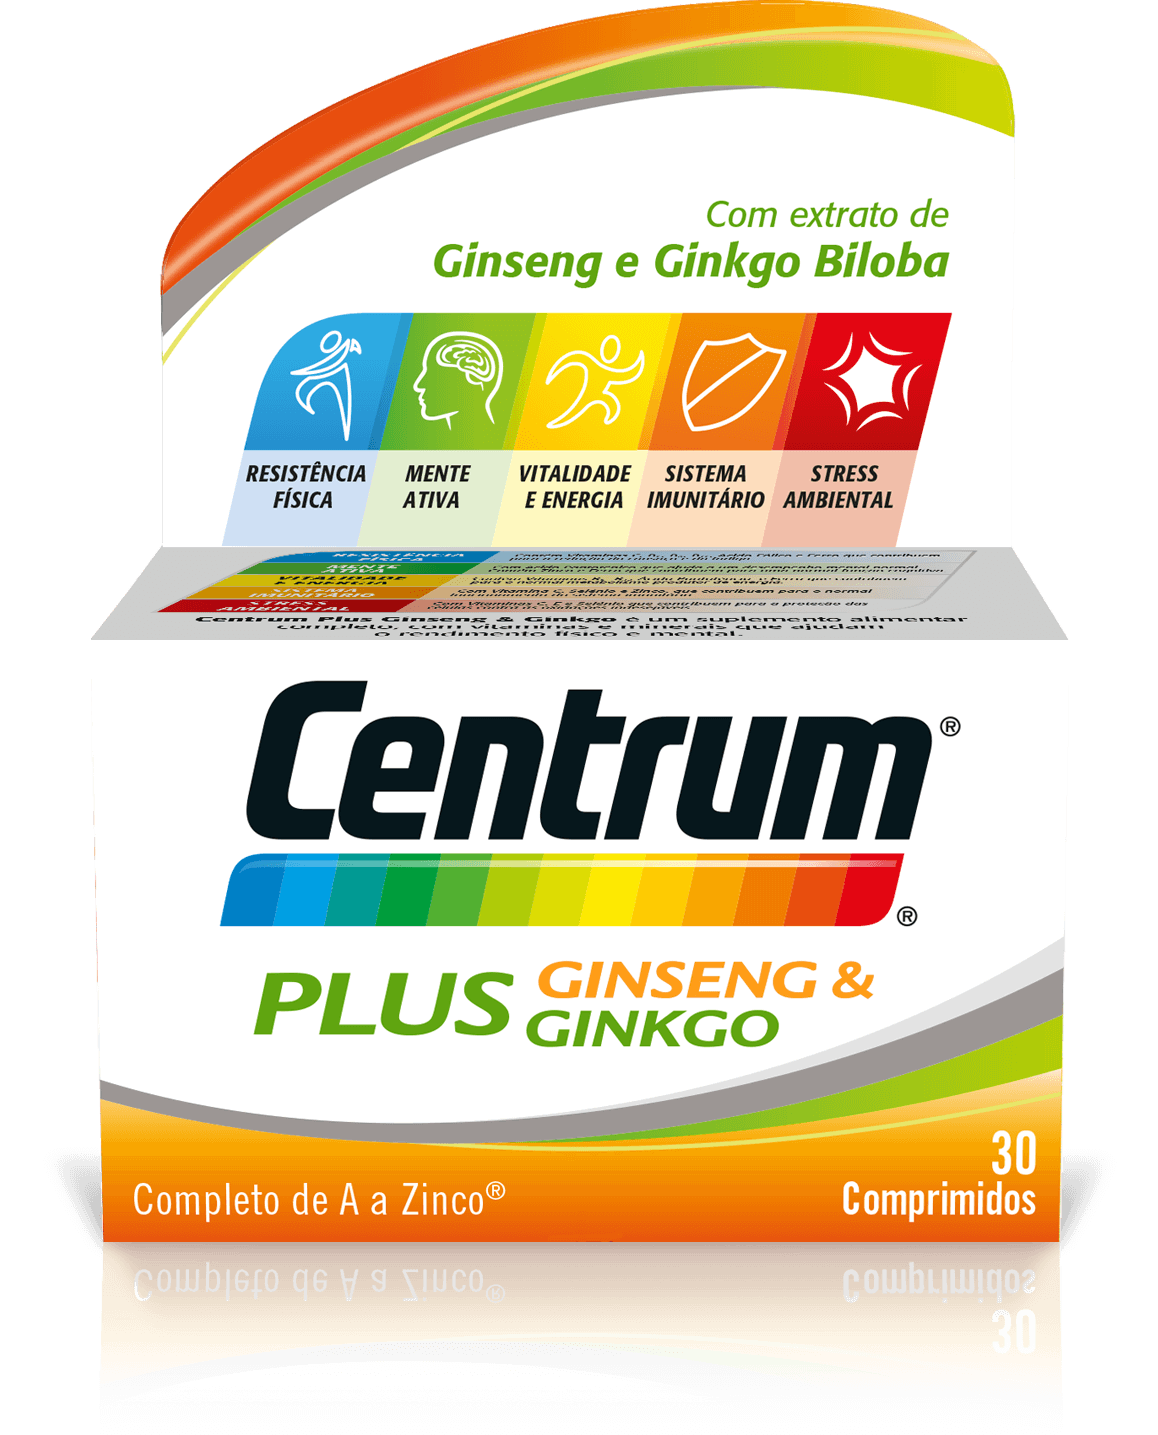 CENTRUM PLUS GINSENG GINKGO 30 COMPRIMIDOS